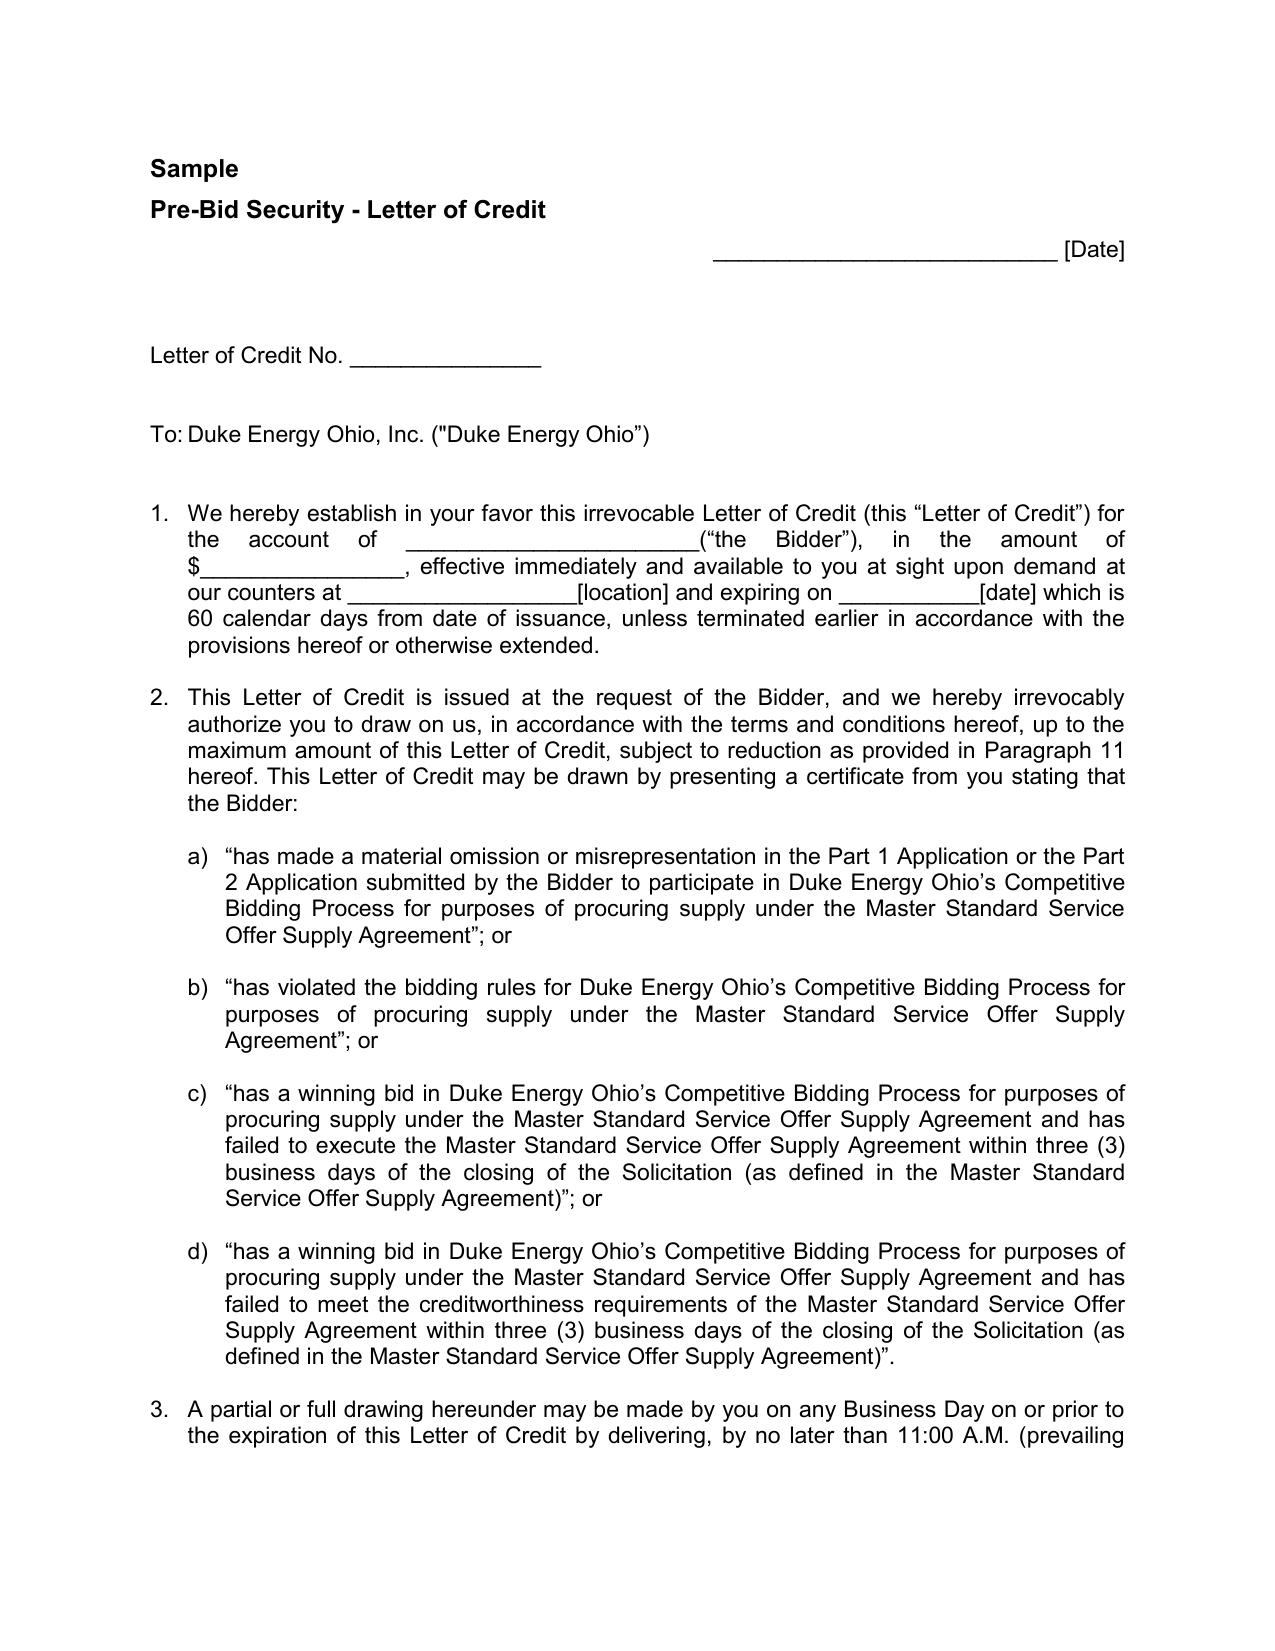 Sample Pre Bid Security Letter Of Credit Date Letter Of Credit No